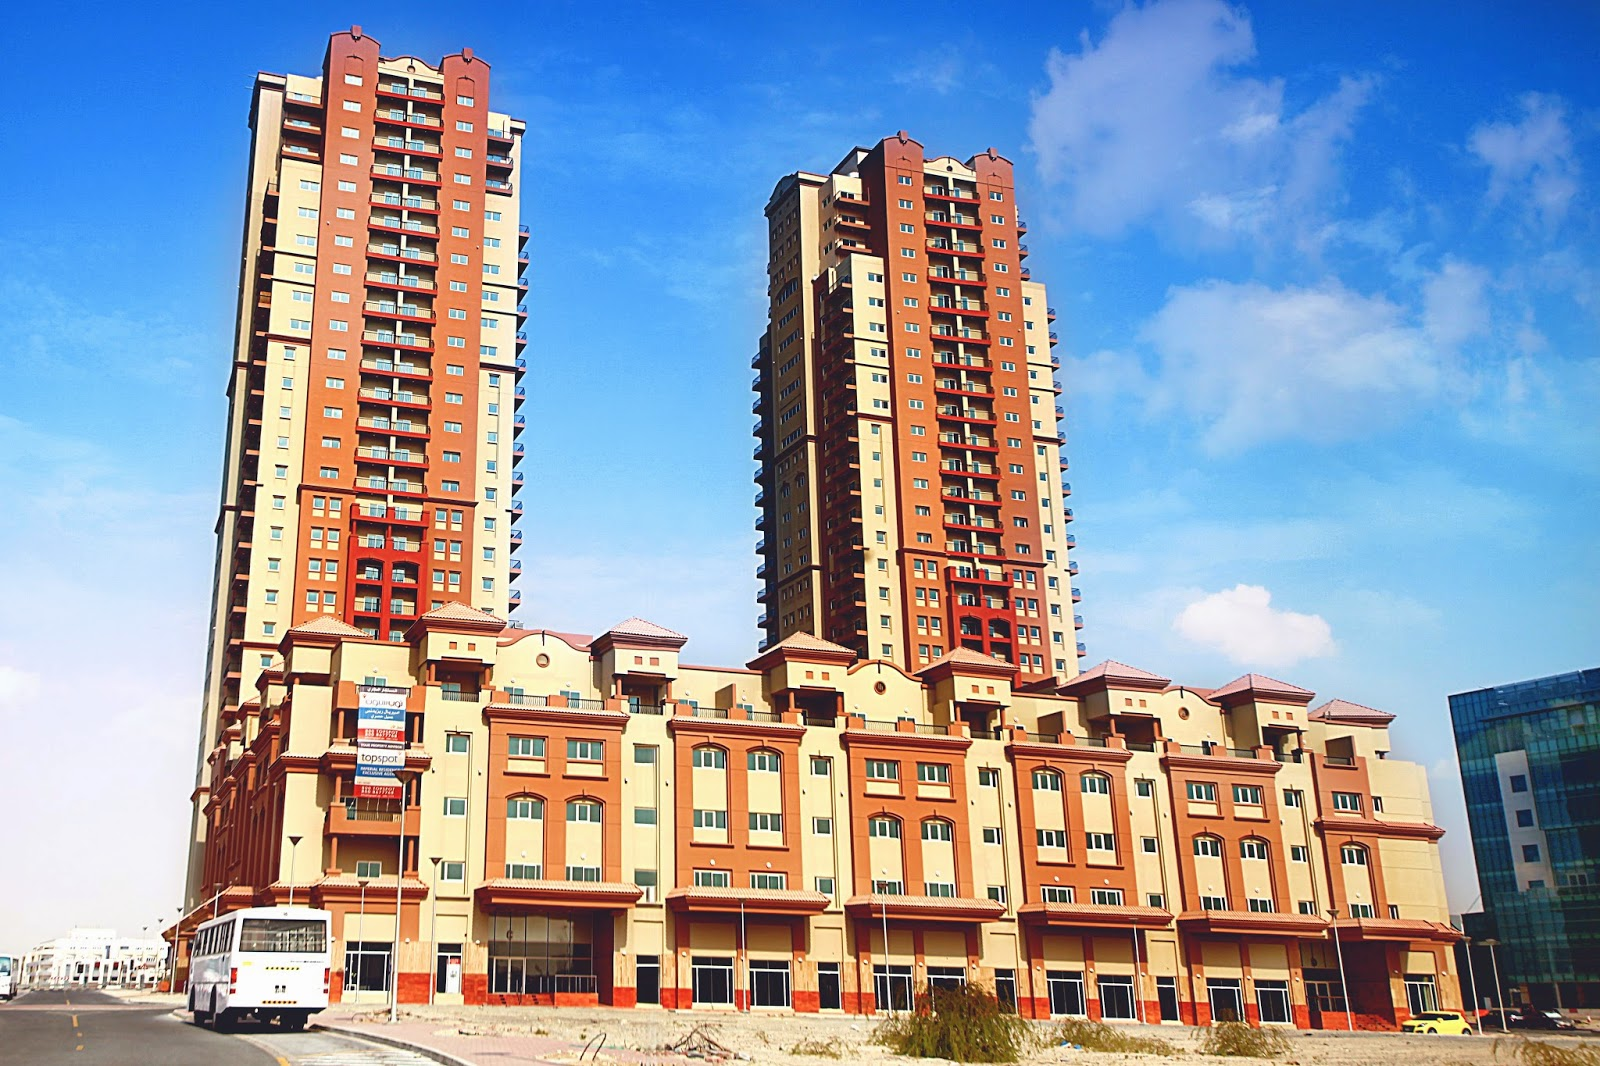 Auris group announces new hotel in dubai uae for The newest hotel in dubai